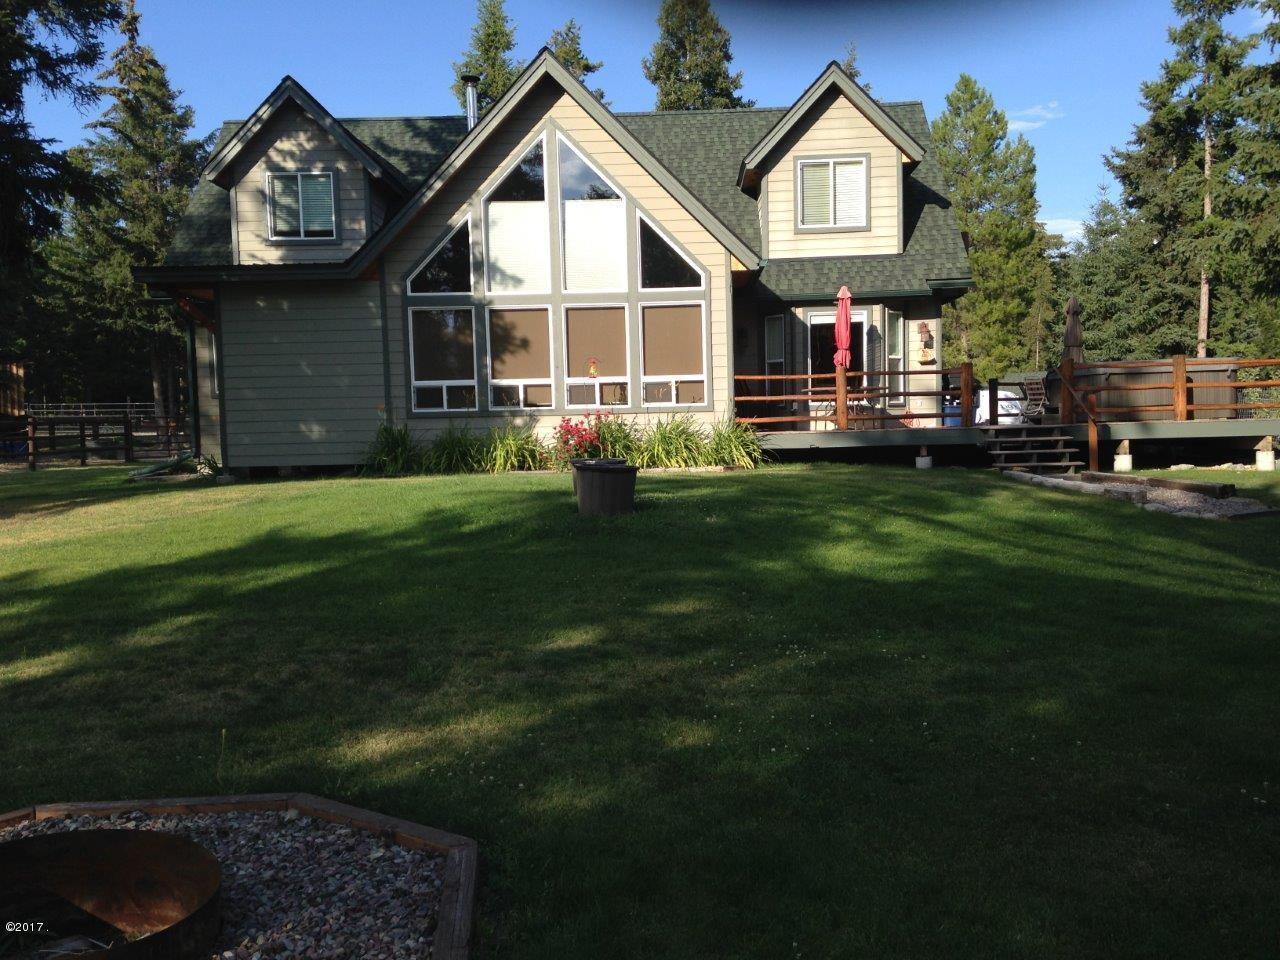 Montana flathead county kila - Additional Photo For Property Listing At 5129 Ashley Lake Road Kila Montana 59920 United States